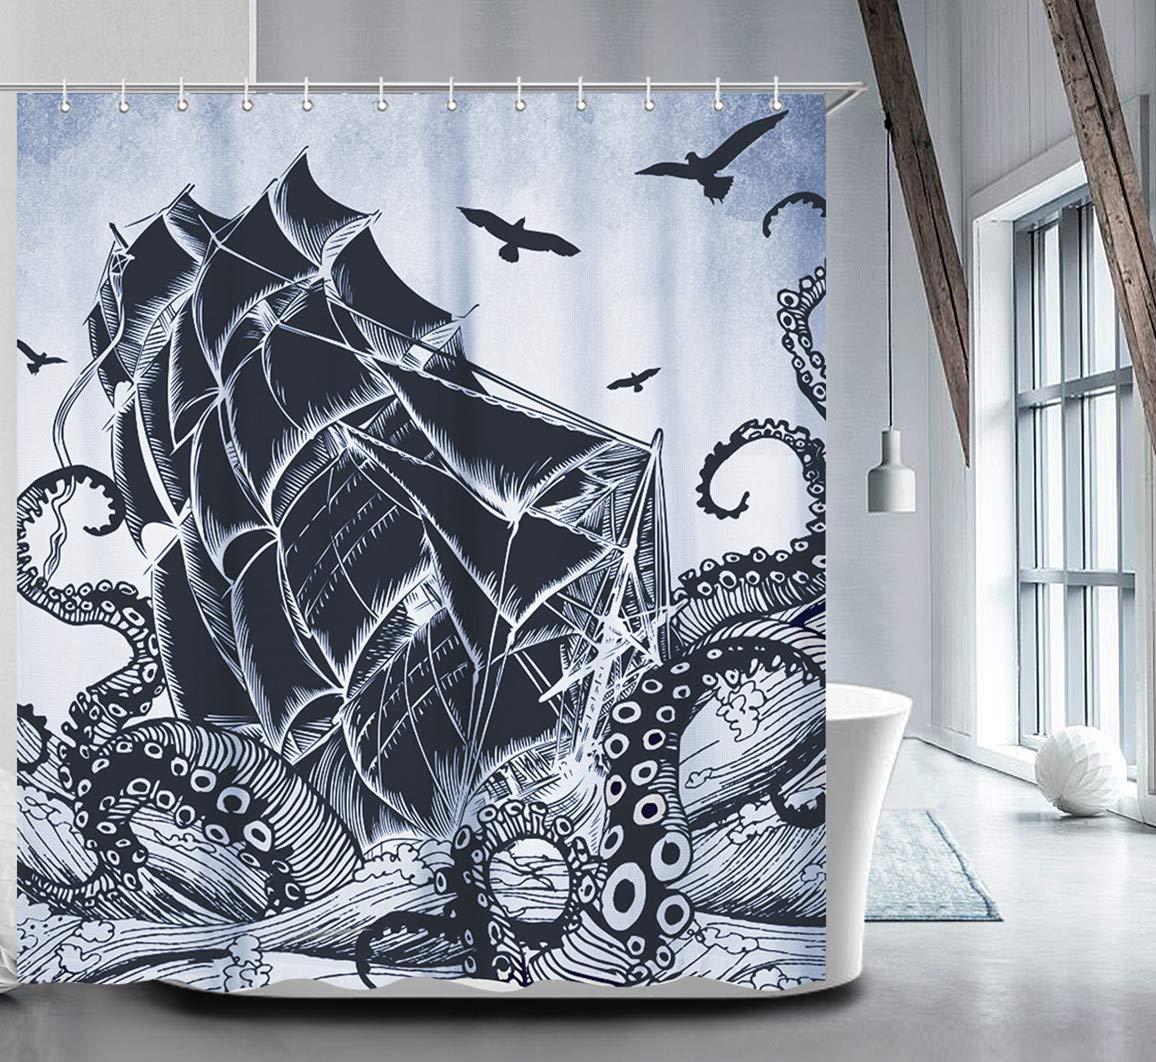 Nautical Shower Curtain Set with 12 Hooks Kraken Bathroom Curtains Fabric Decorative Bath Curtain Waterproof Anti-Bacterial Shower Curtain Liner72 x72